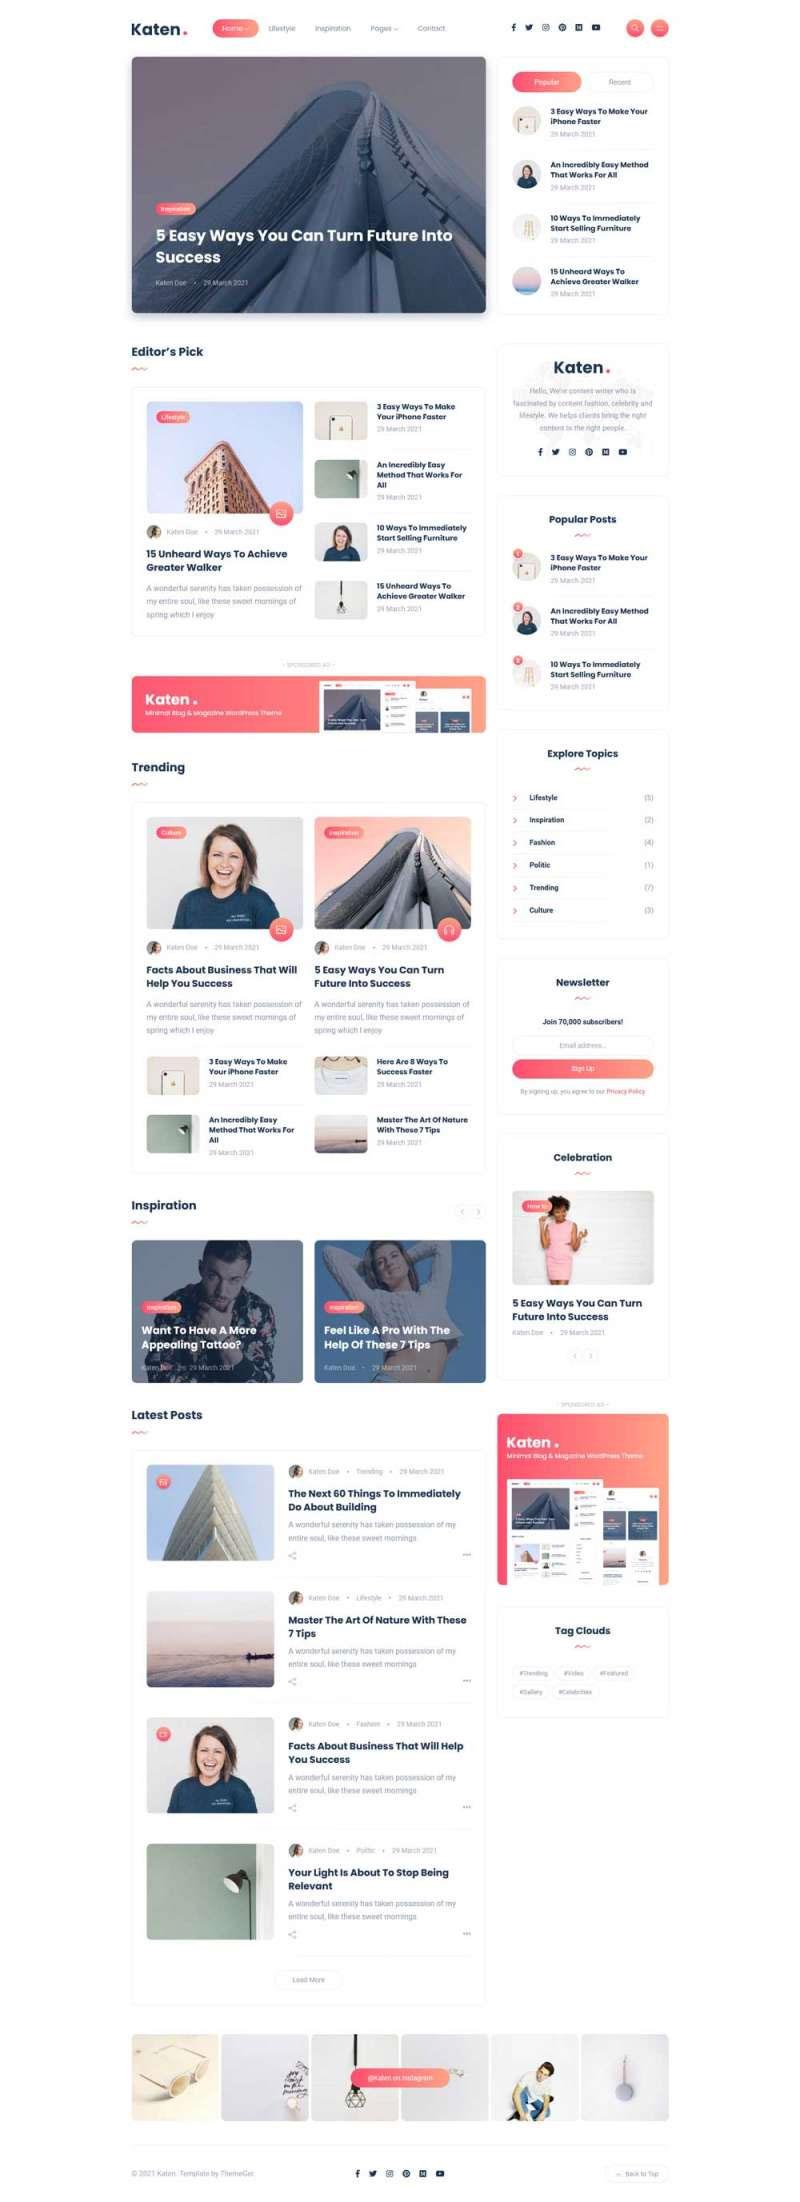 html5简洁响应式图文博客杂志网站模板